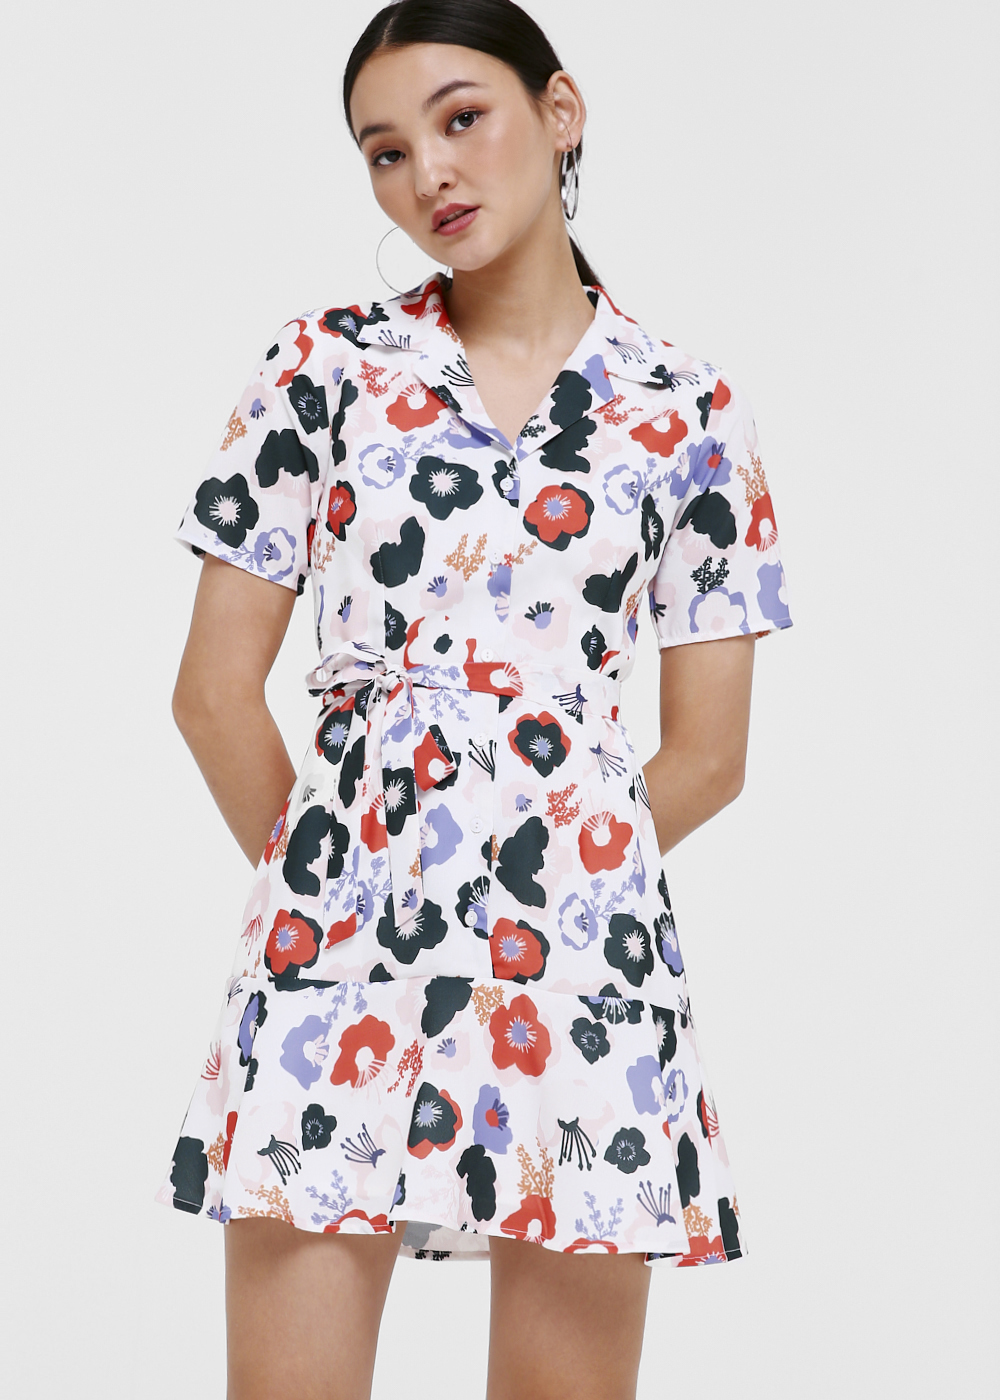 Kenia Sash Tie Shirt Dress in Anemone Bloom